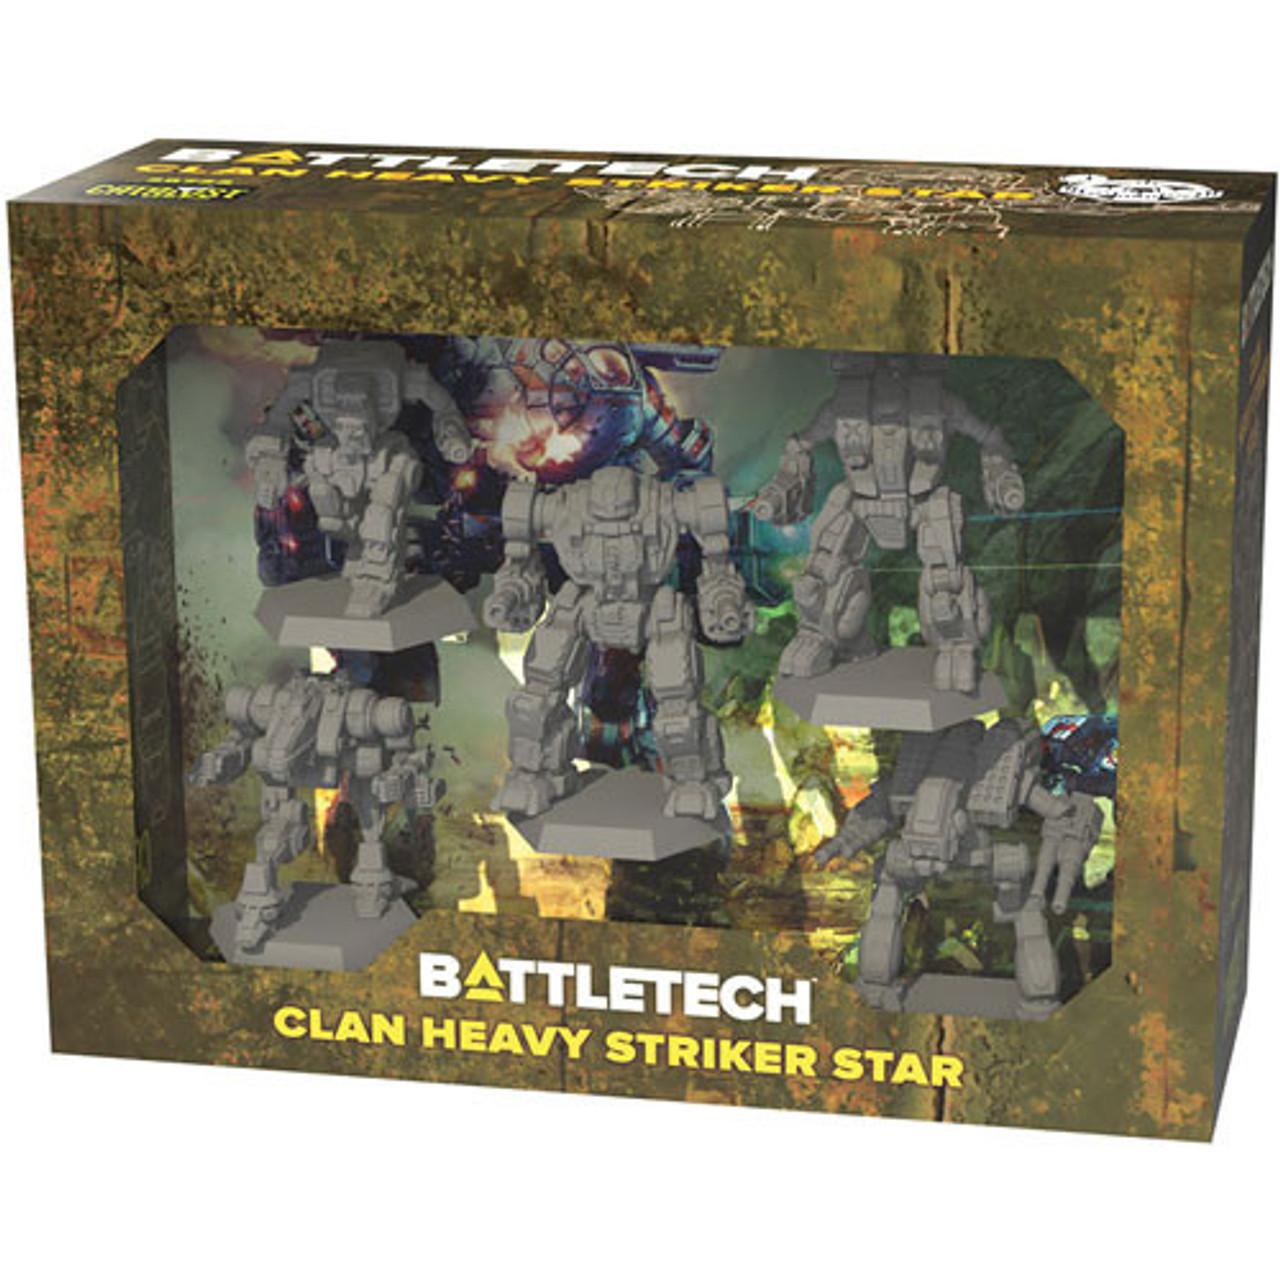 Battletech: Clan Heavy Striker Star Miniature Set